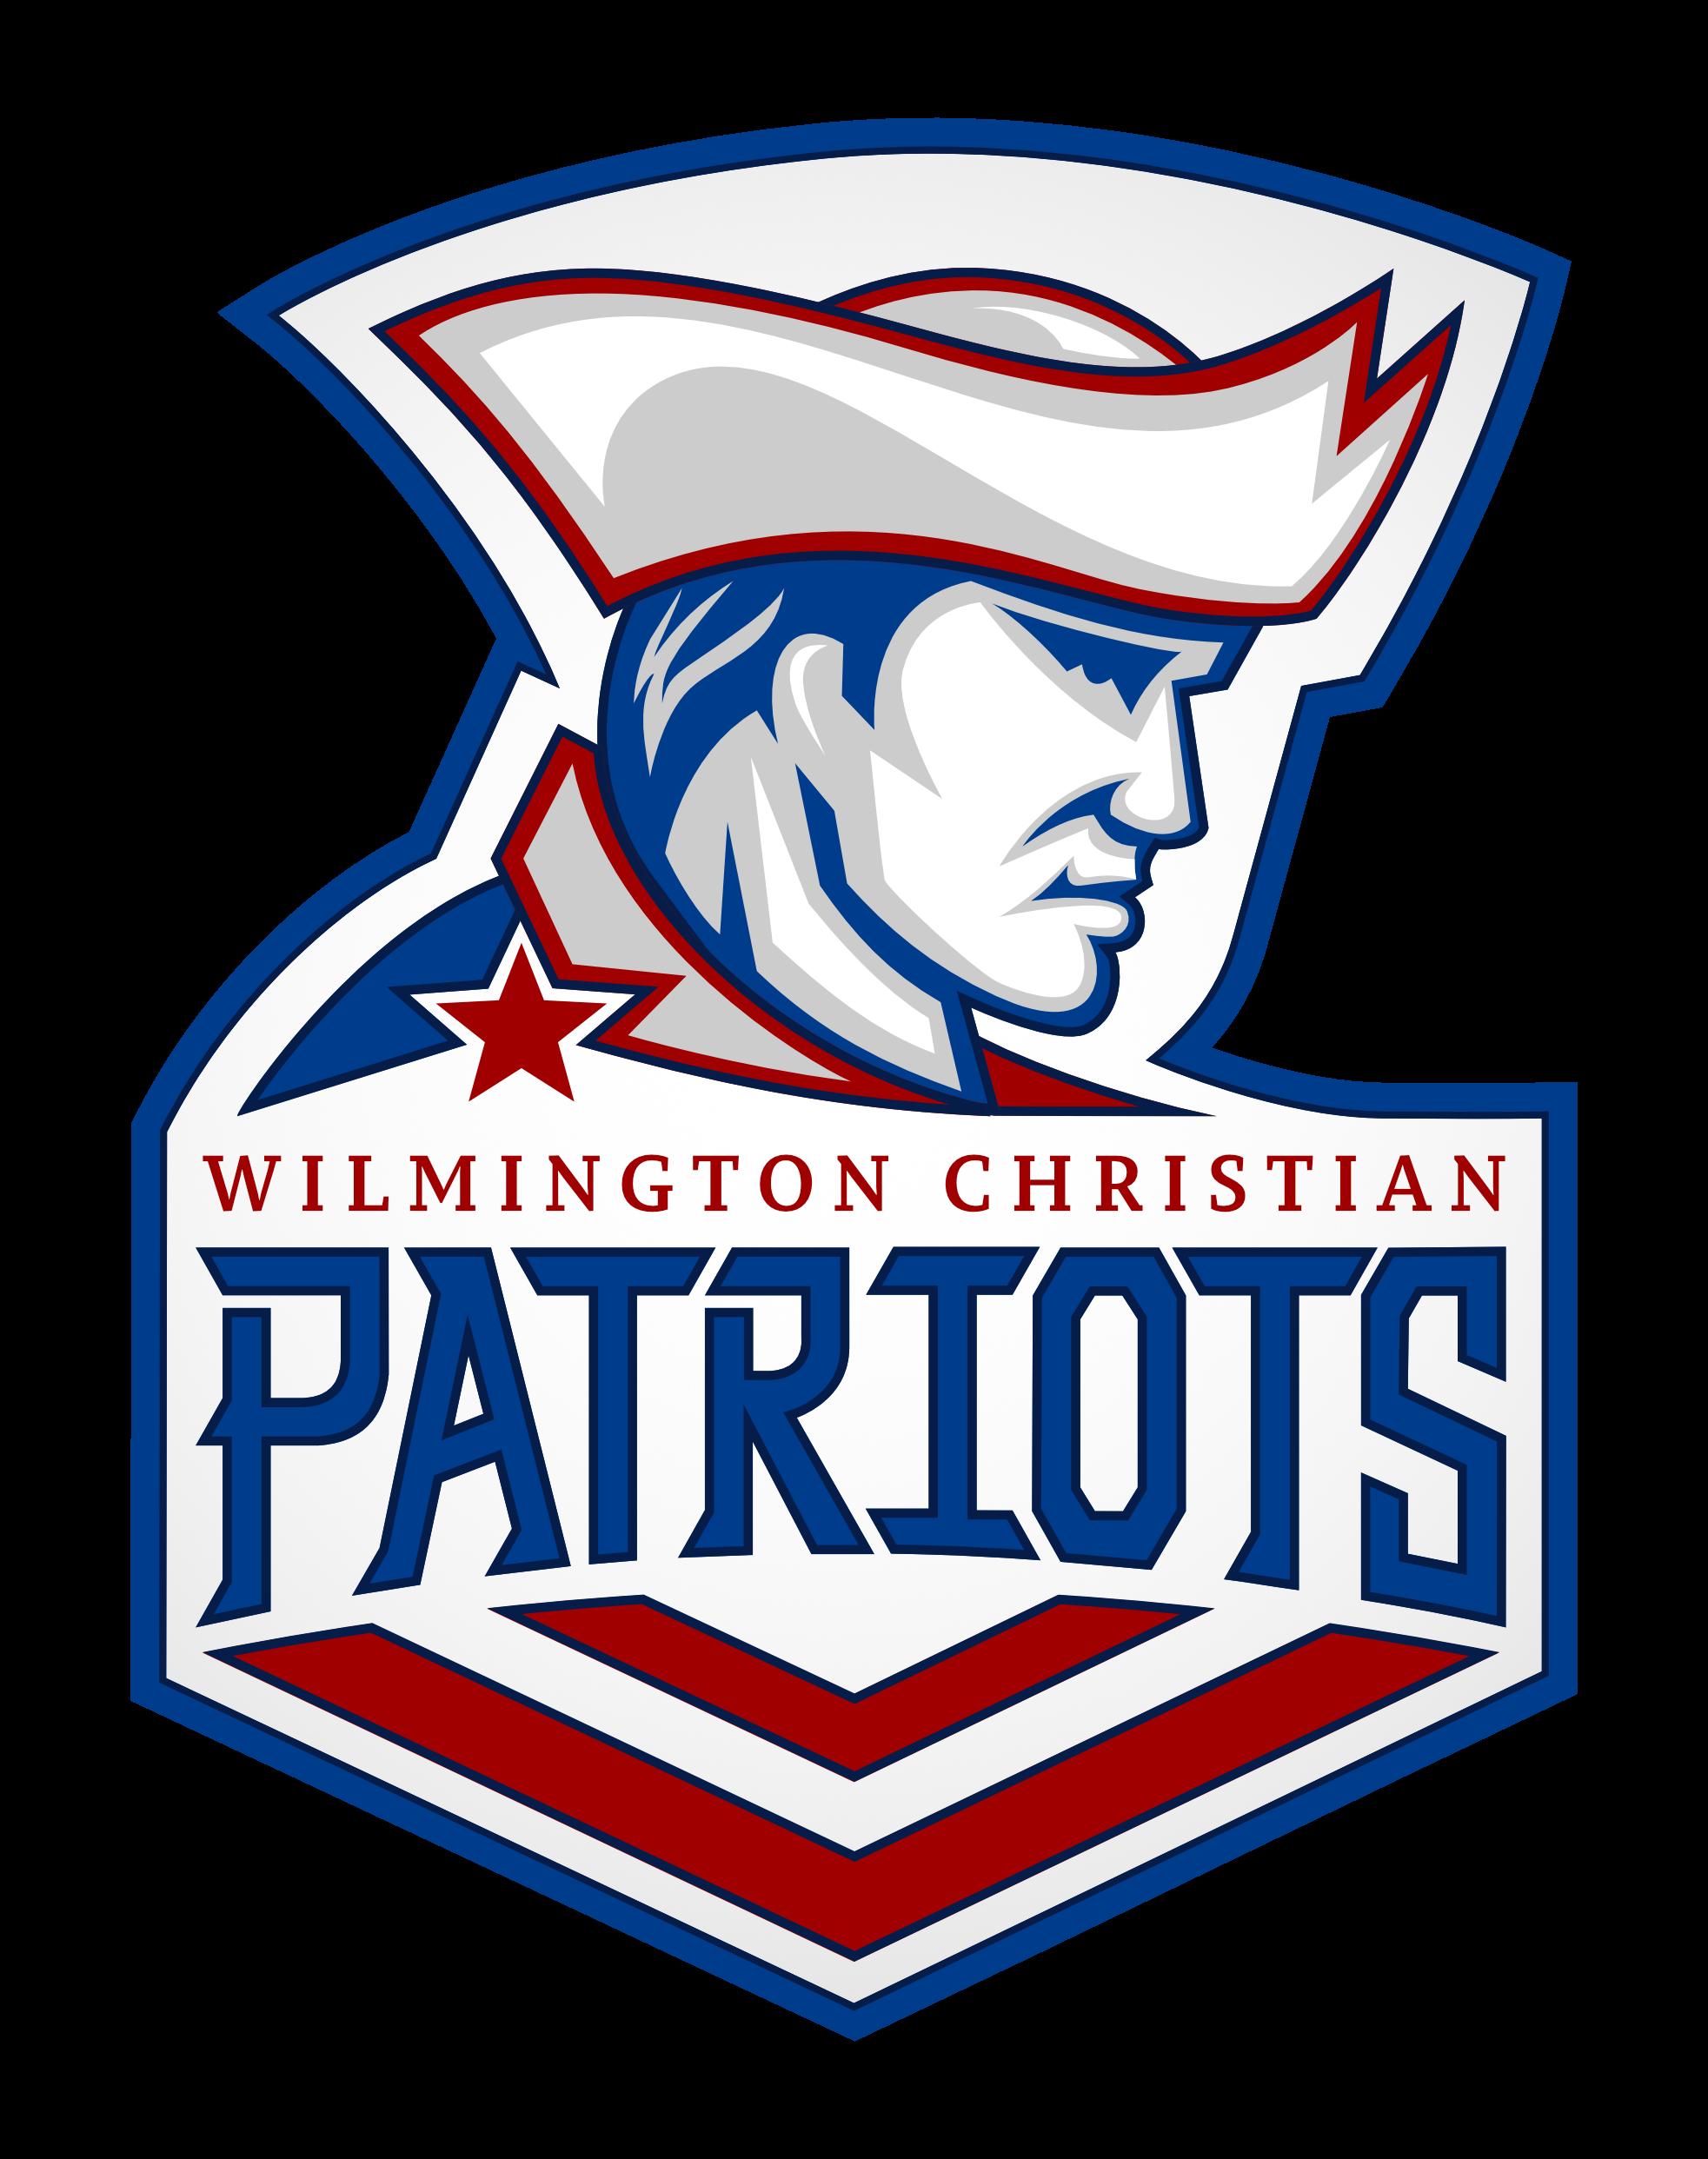 Final Patriot Logo.png